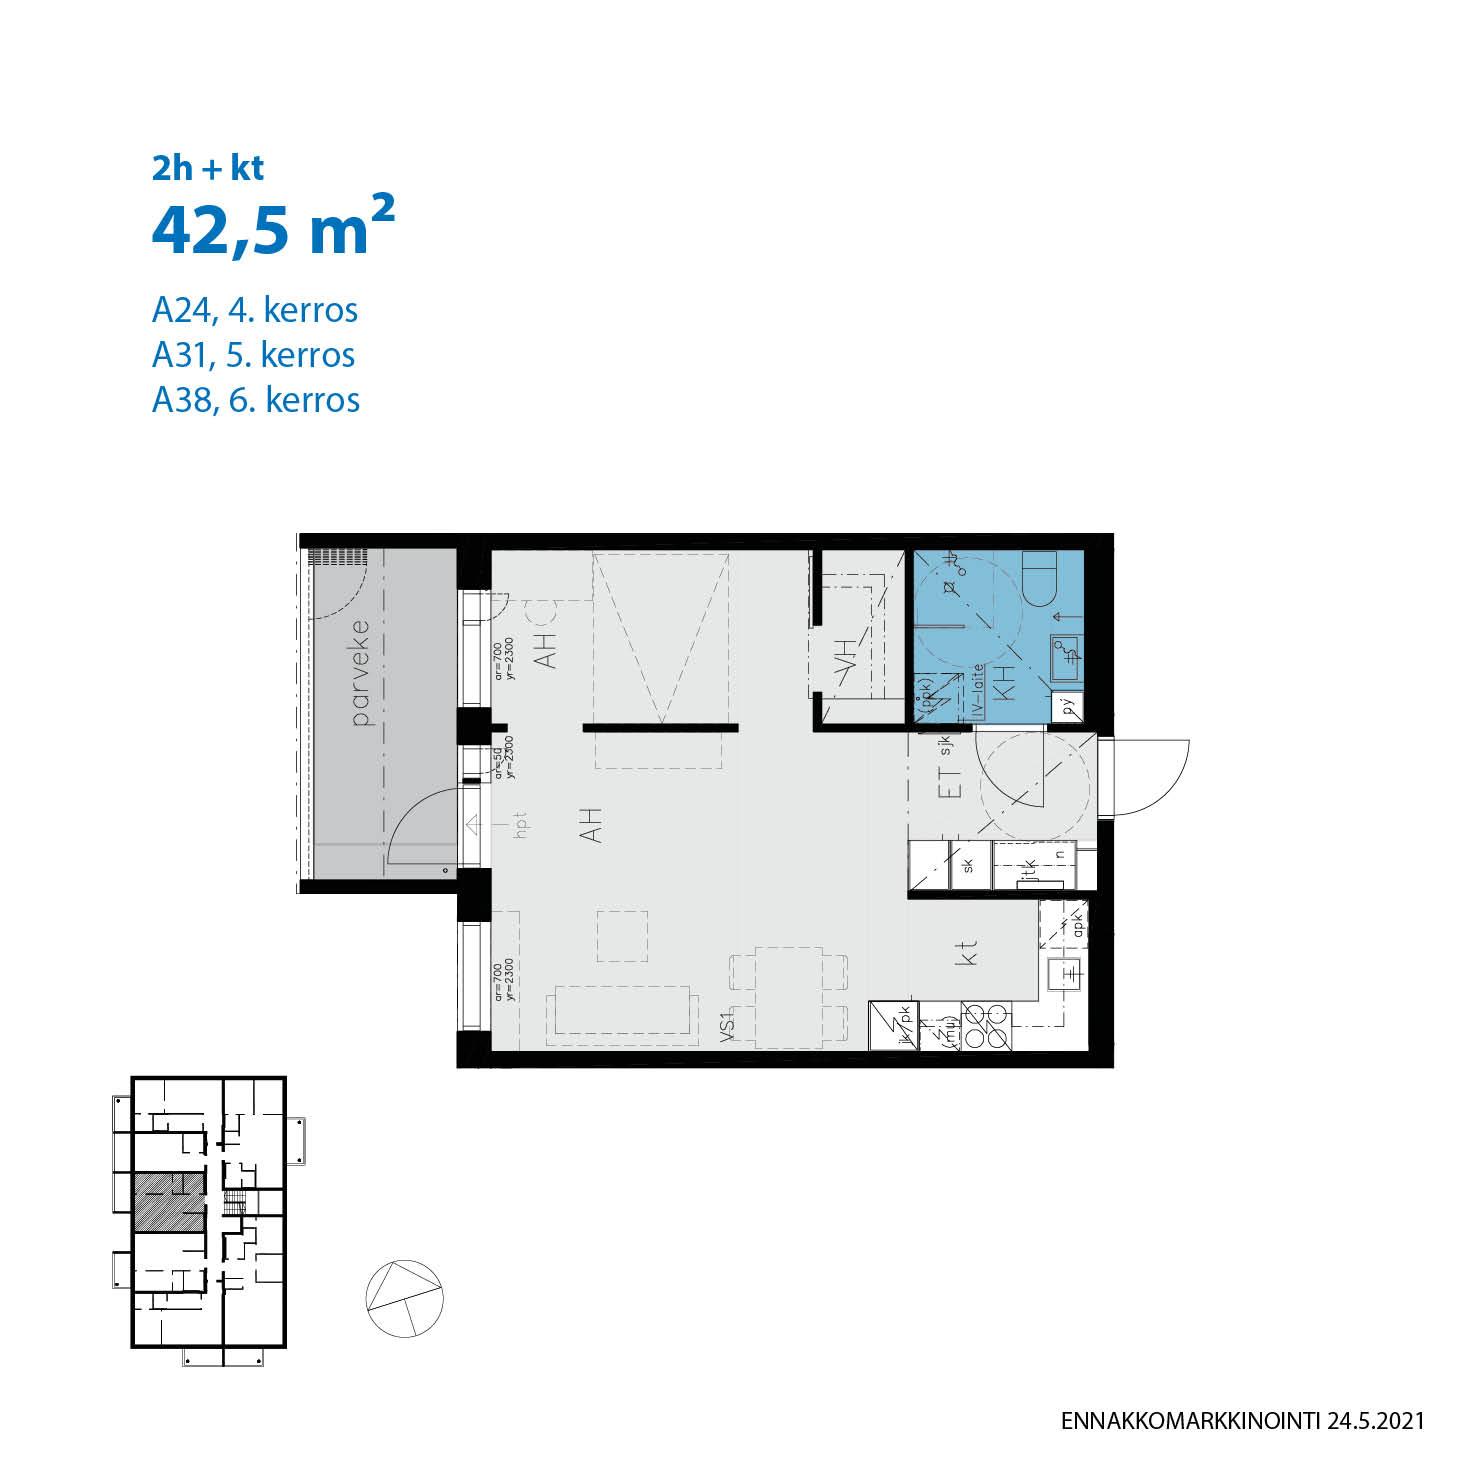 A31, 42.5 m<sup>2</sup>, 2h+kt